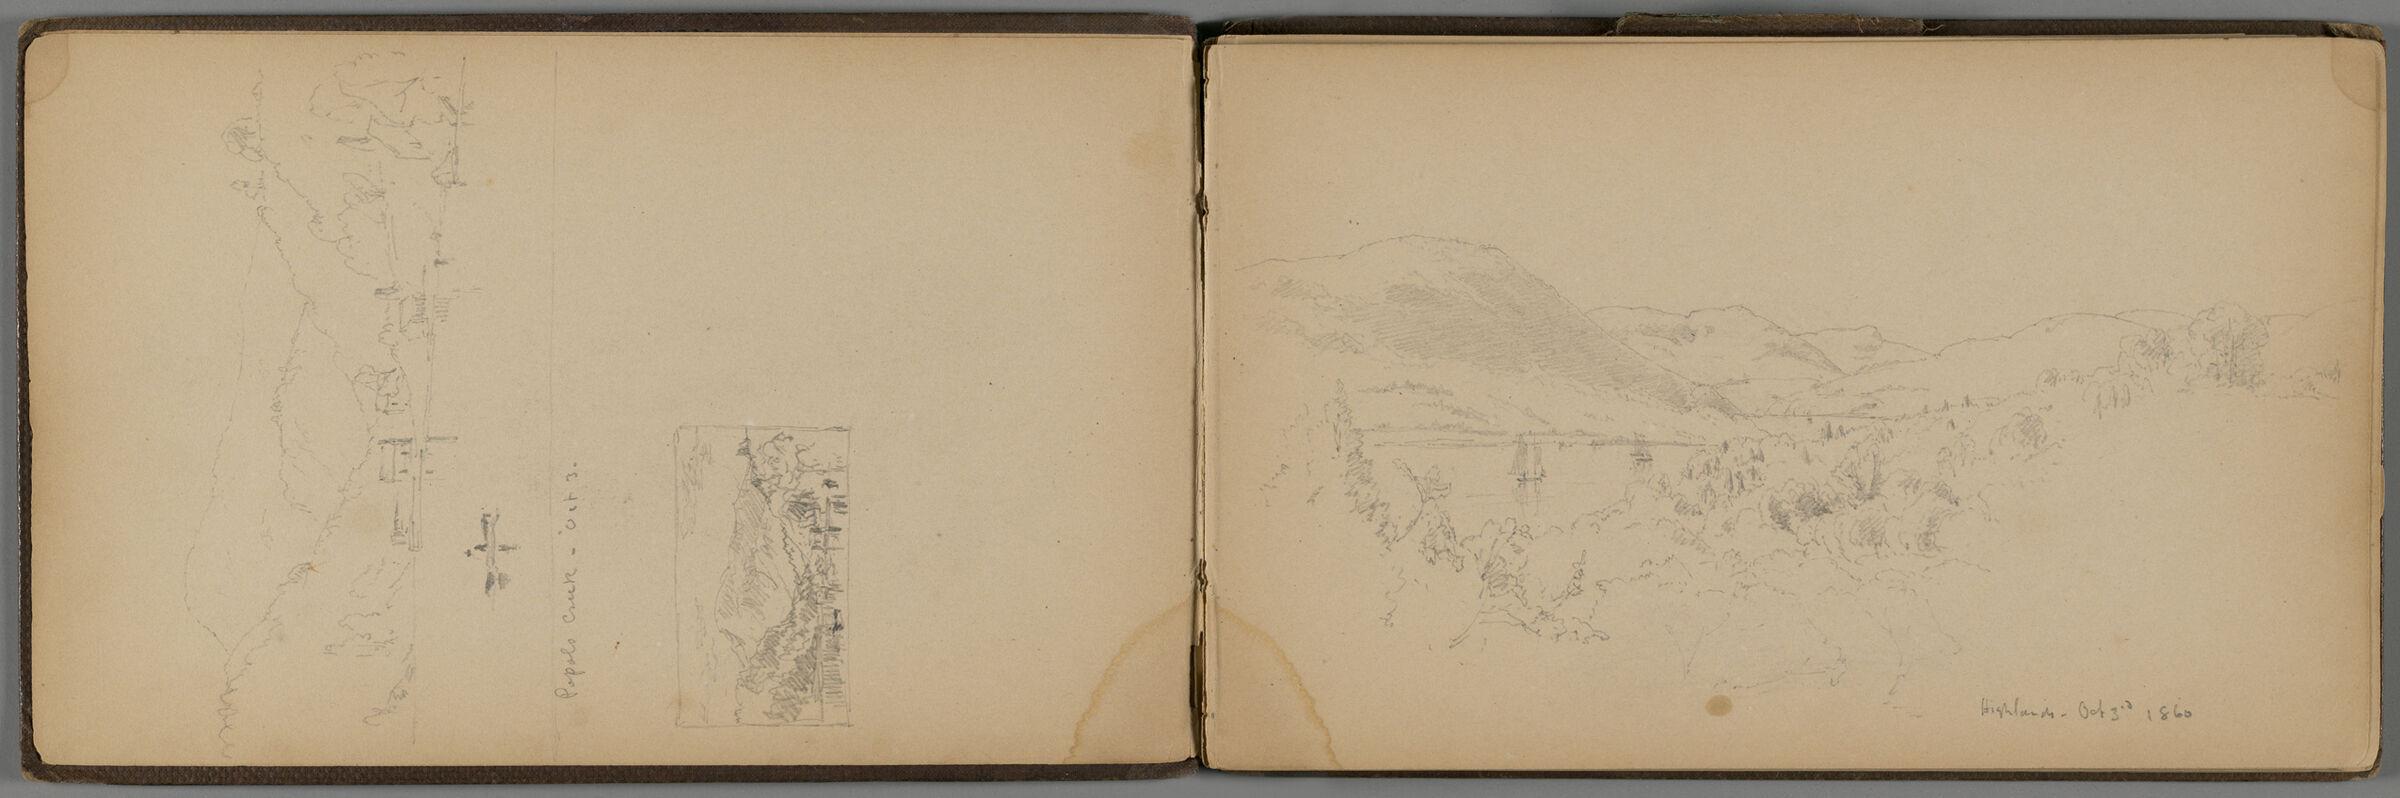 New Hampshire Highlands; Verso: Lake Sunapee, New Hampshire